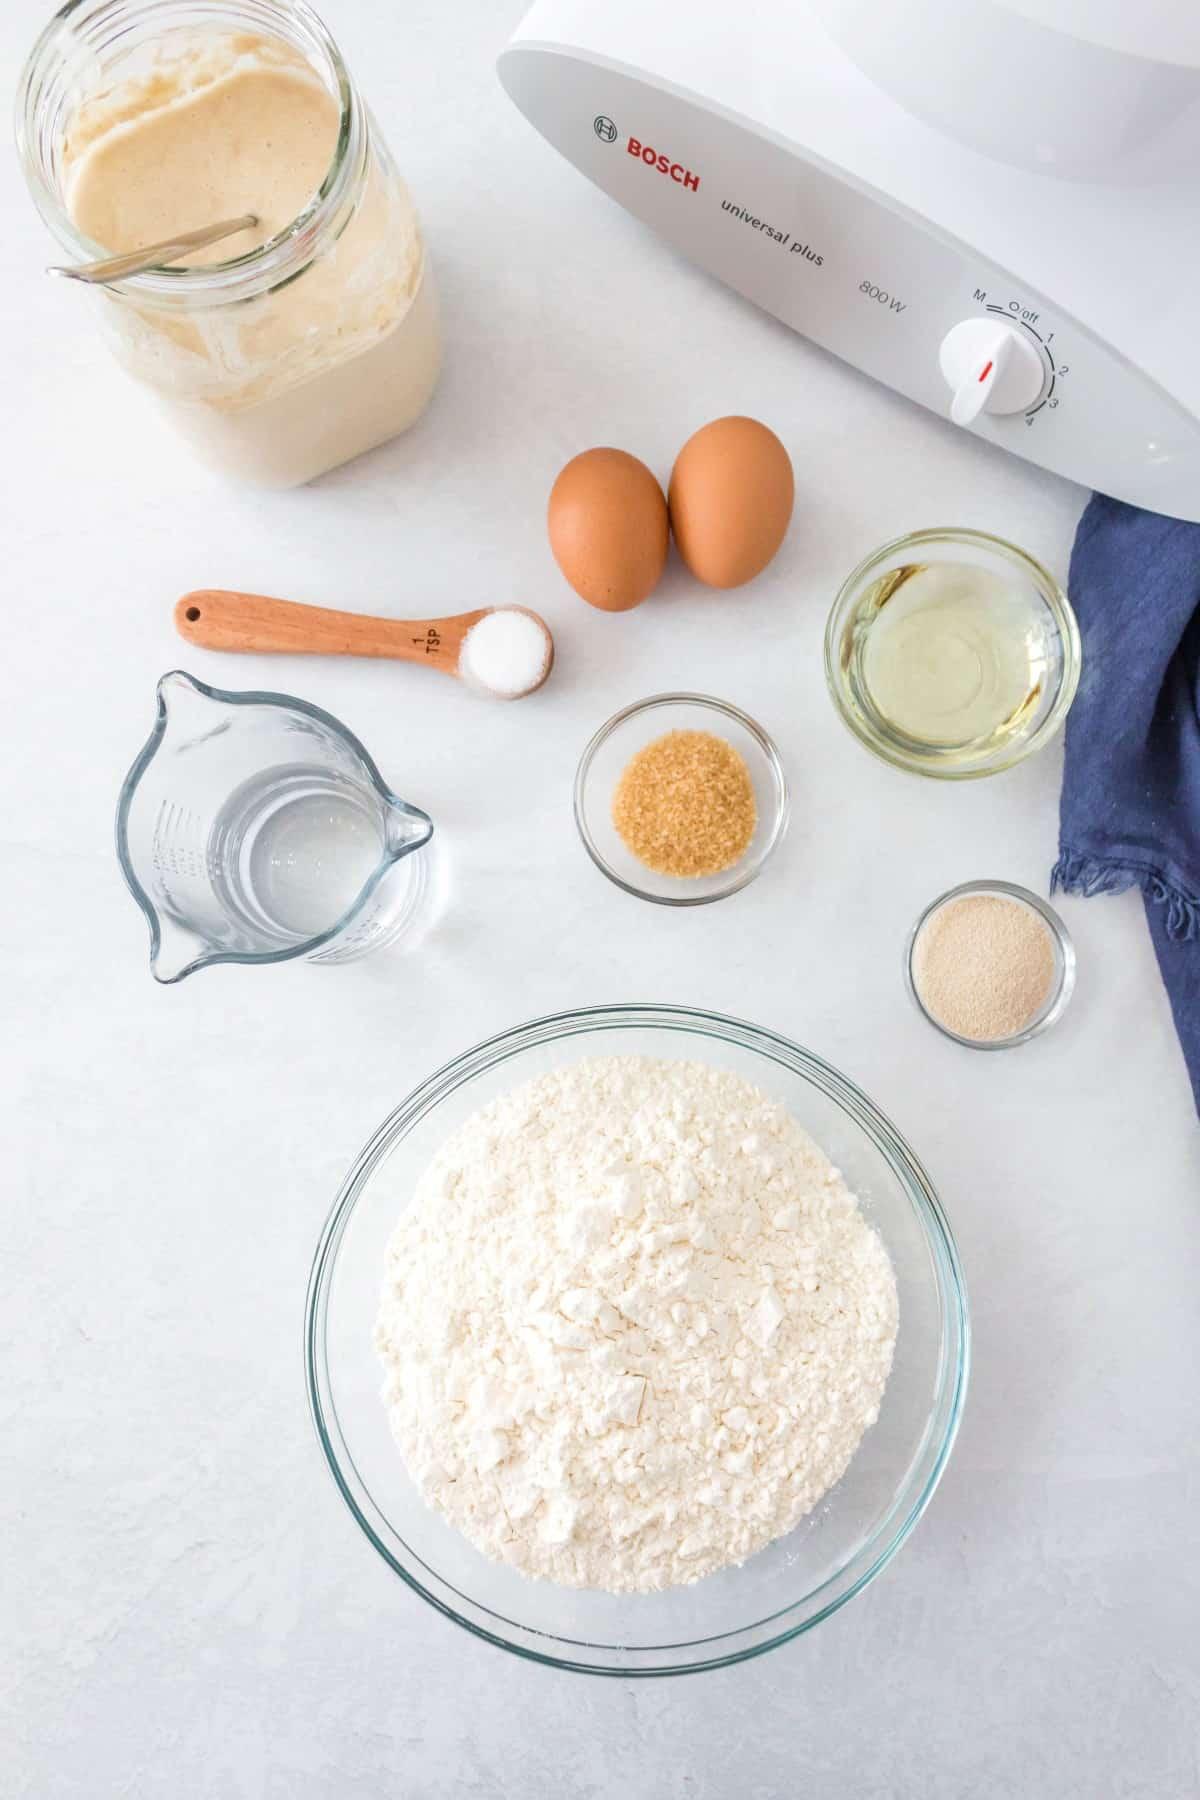 Ingredients for sourdough dinner rolls.